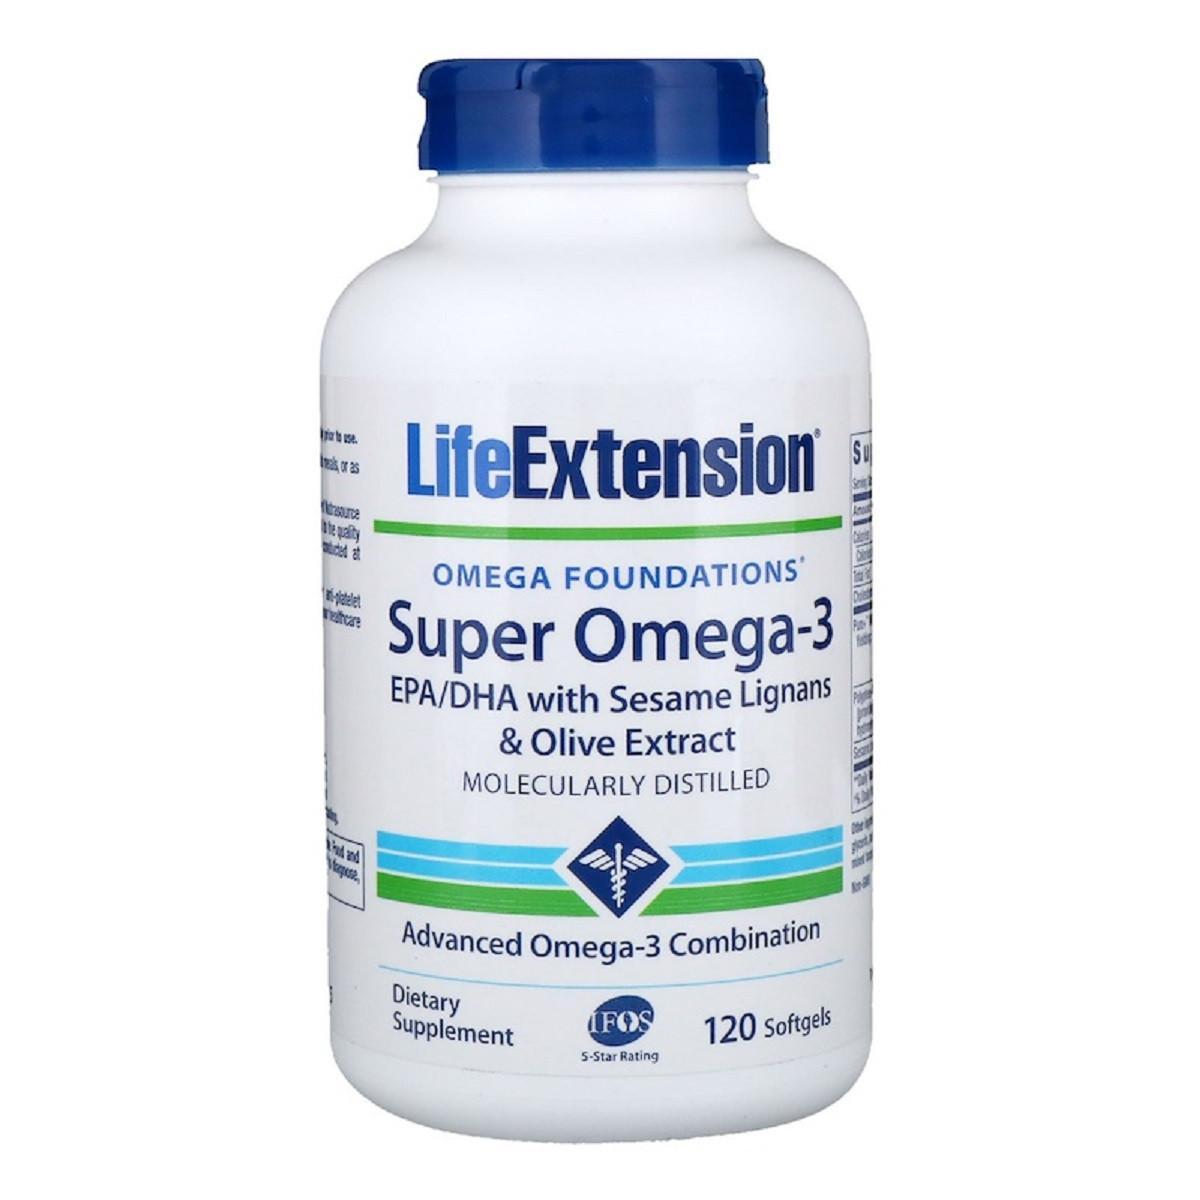 Супер Омега-3 Omega Foundations Super Omega-3 Life Extension 120 Желатинових Капсул